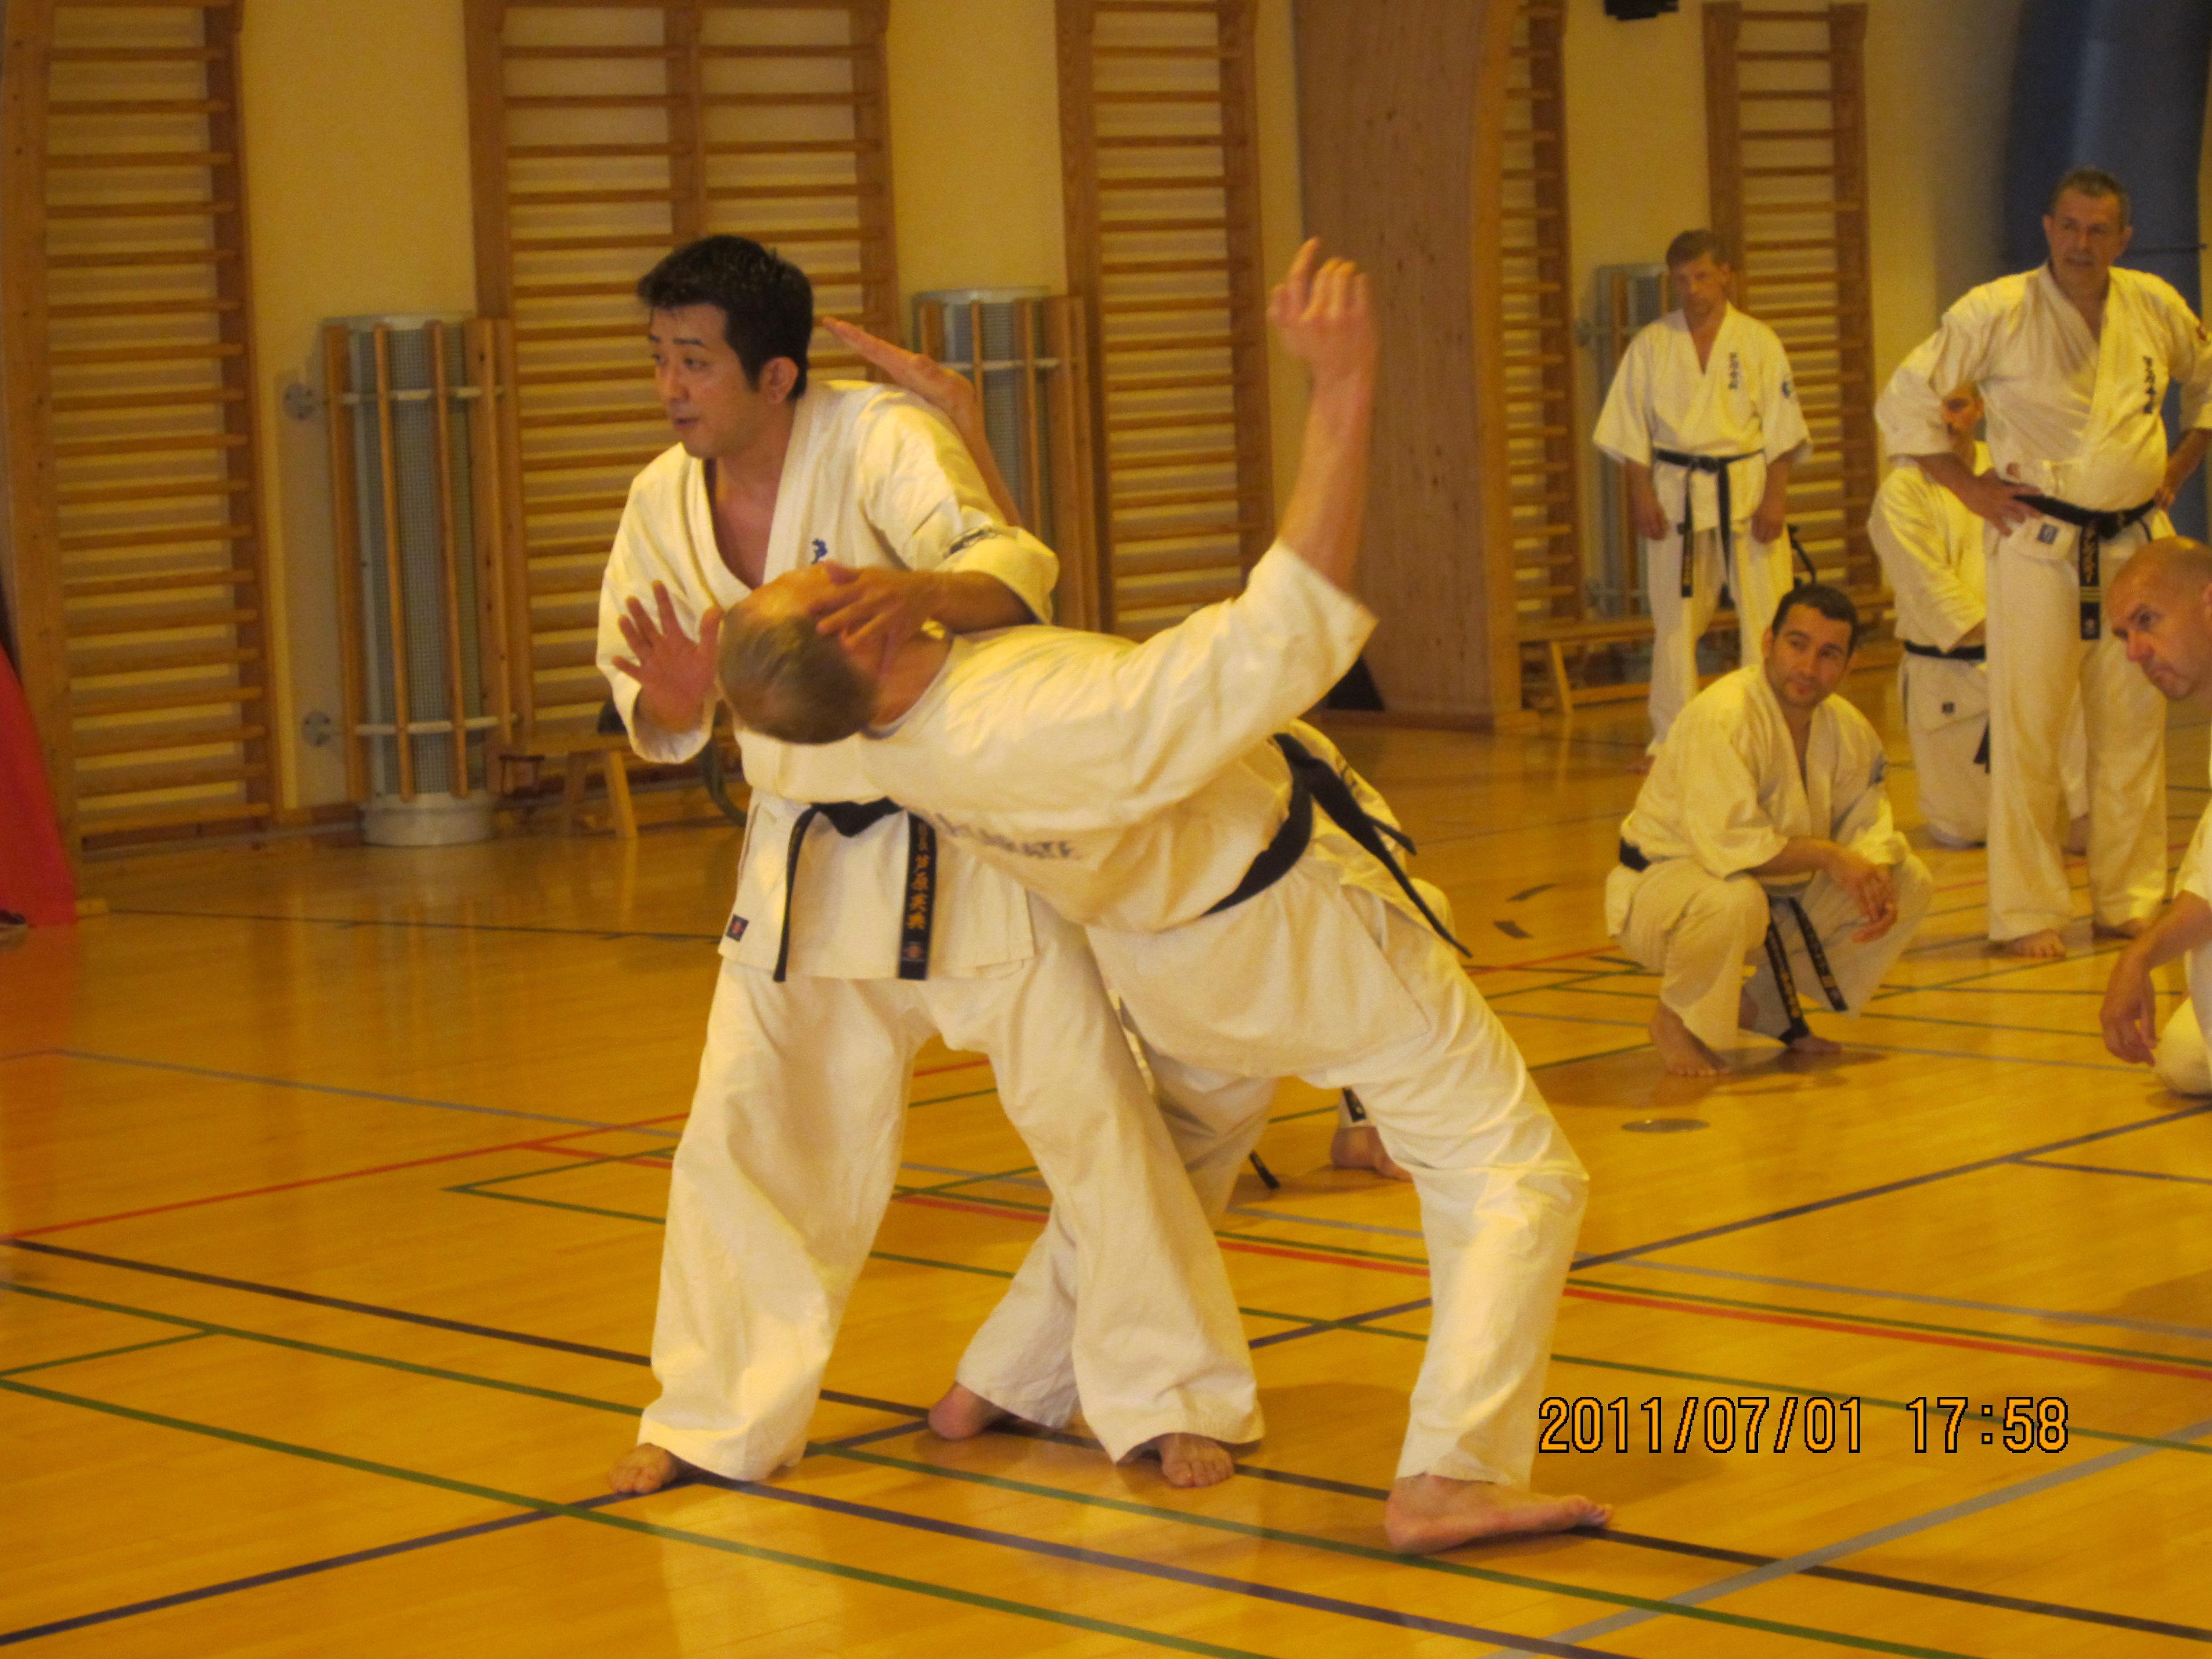 Ashihara Karate Sommerlejr på Bosei Idrætshøjskole